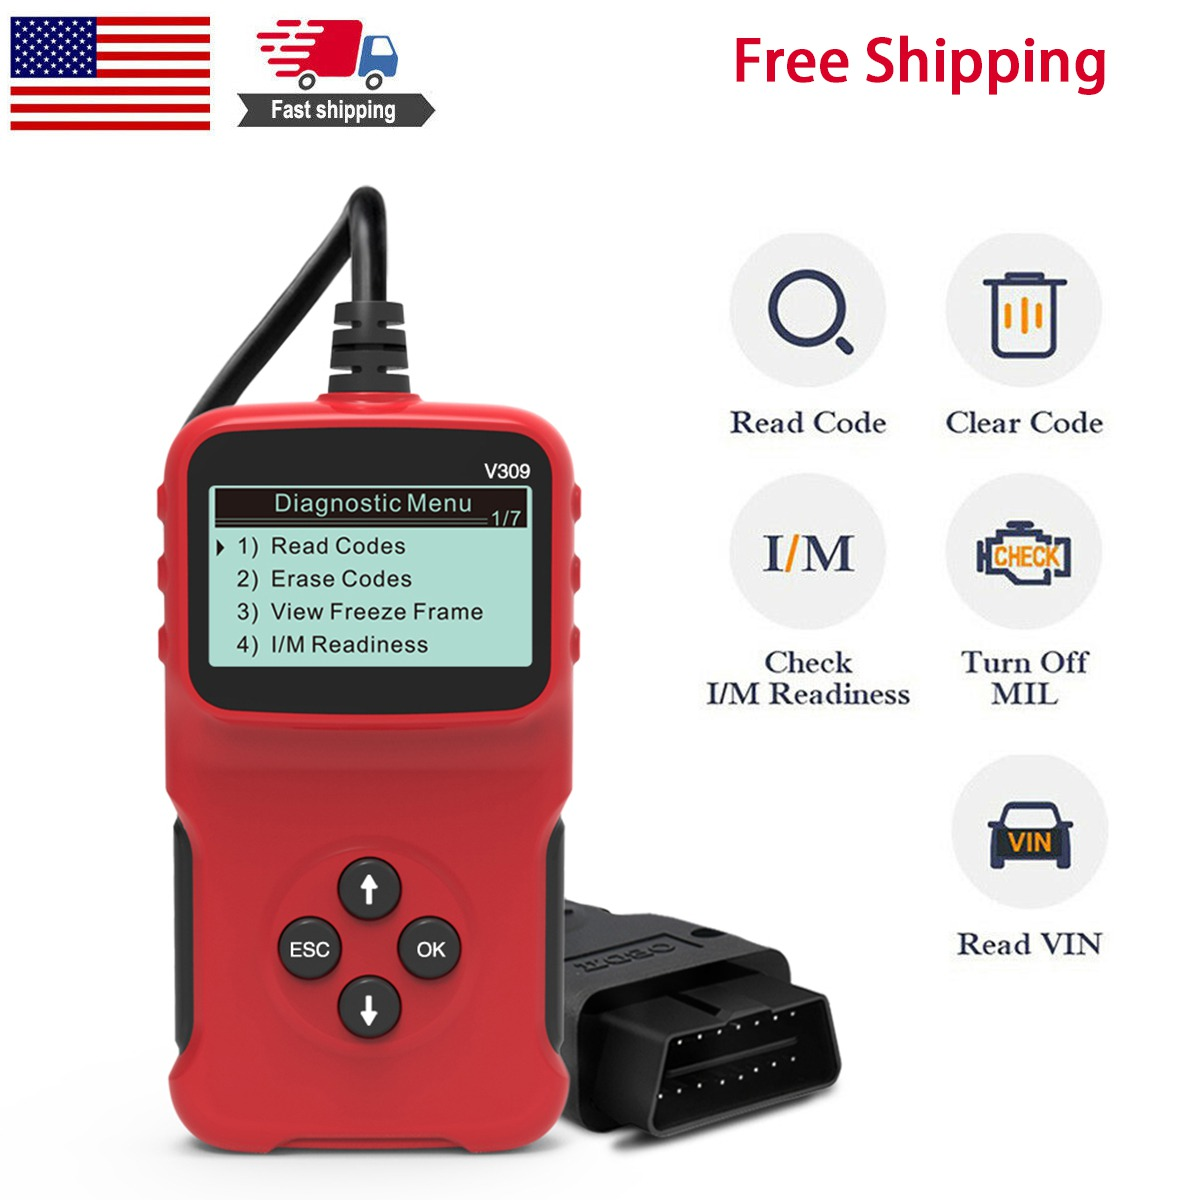 Red Universal OBD II Car Diagnostic Scanner Code Reader Automotive Fault Diagnostic Tool for All OBDII Protocol Compliant Vehicles OUK-BT OBD2 Scanner